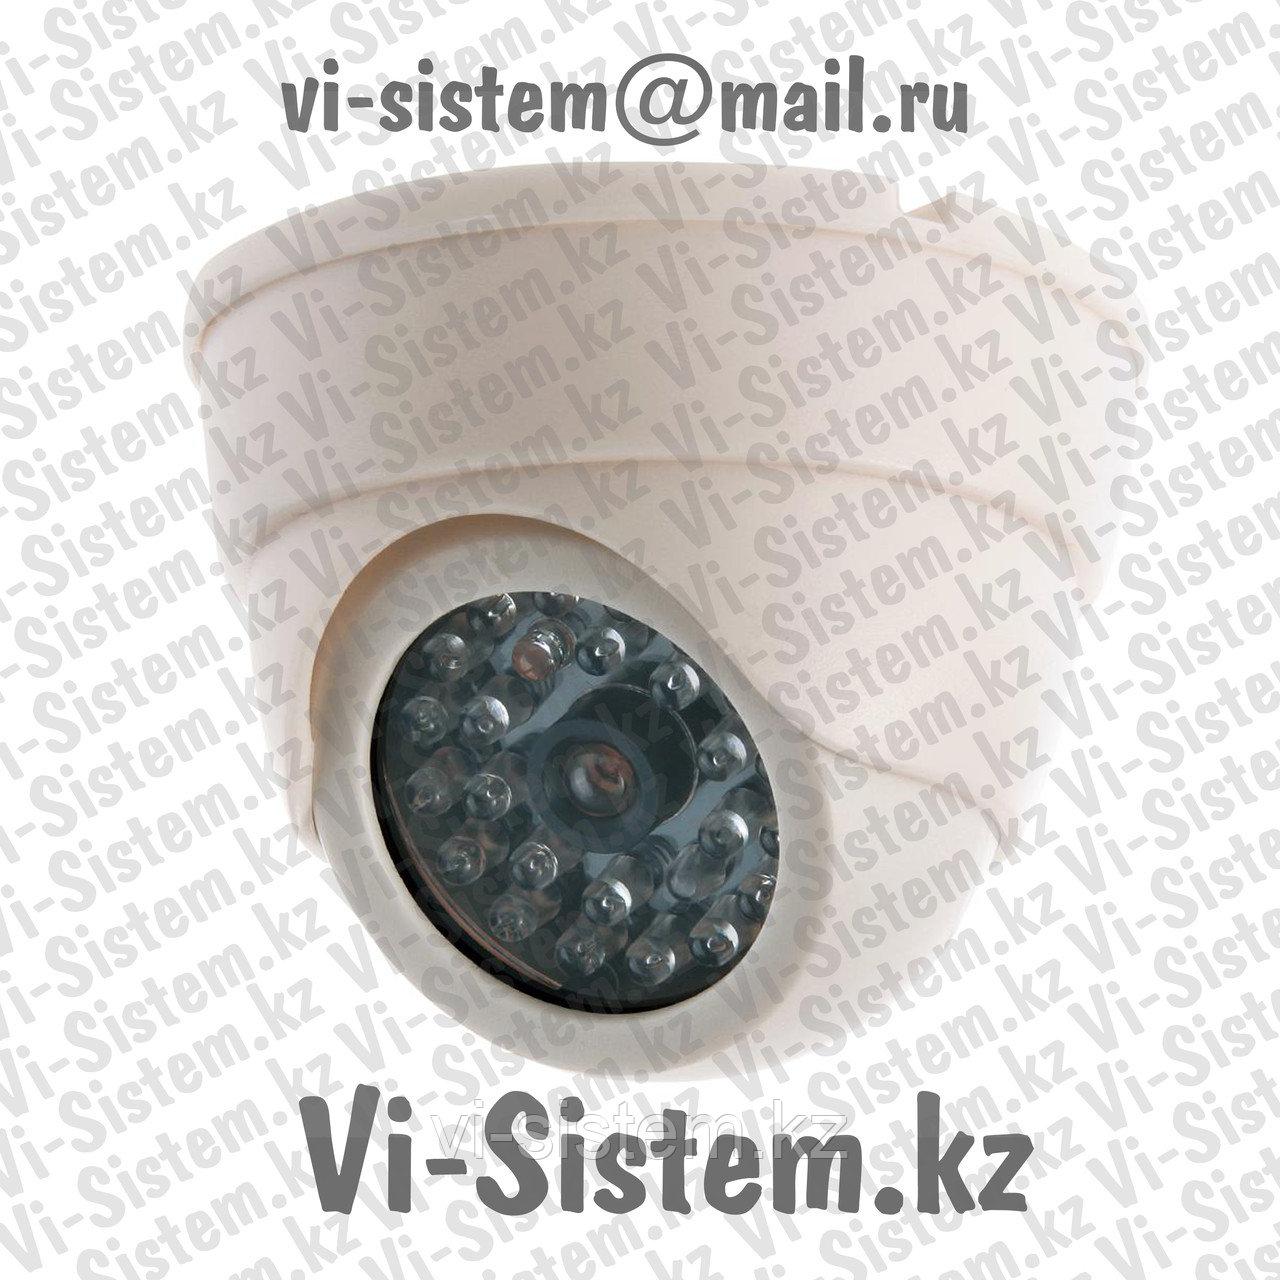 AHD-Видеокамера SYNQAR SY-310 2MP